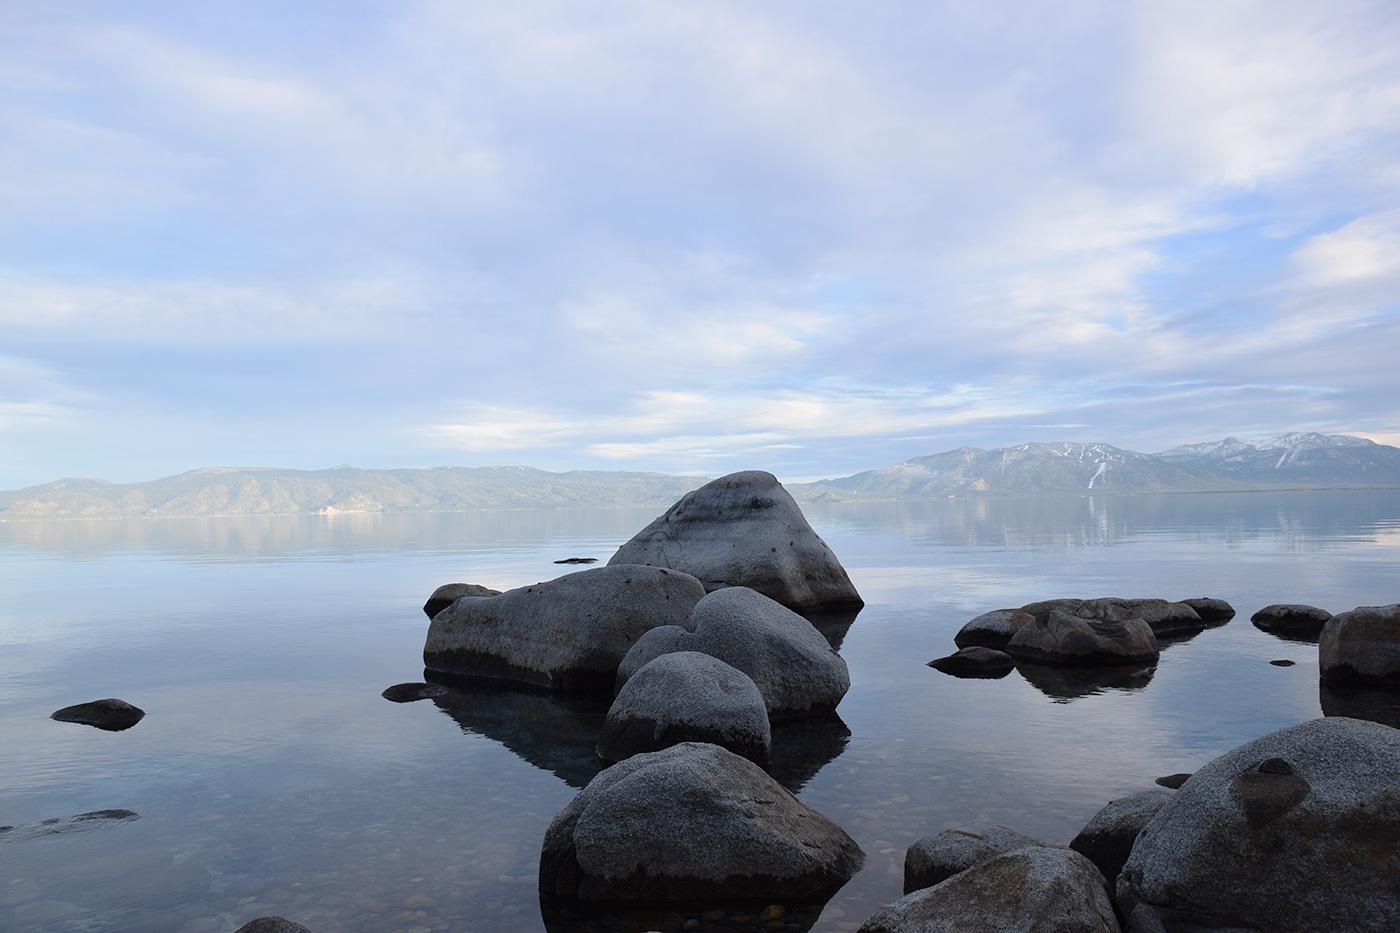 lake-tahoe-sugar-pine-point-hike-big-rocks.jpg